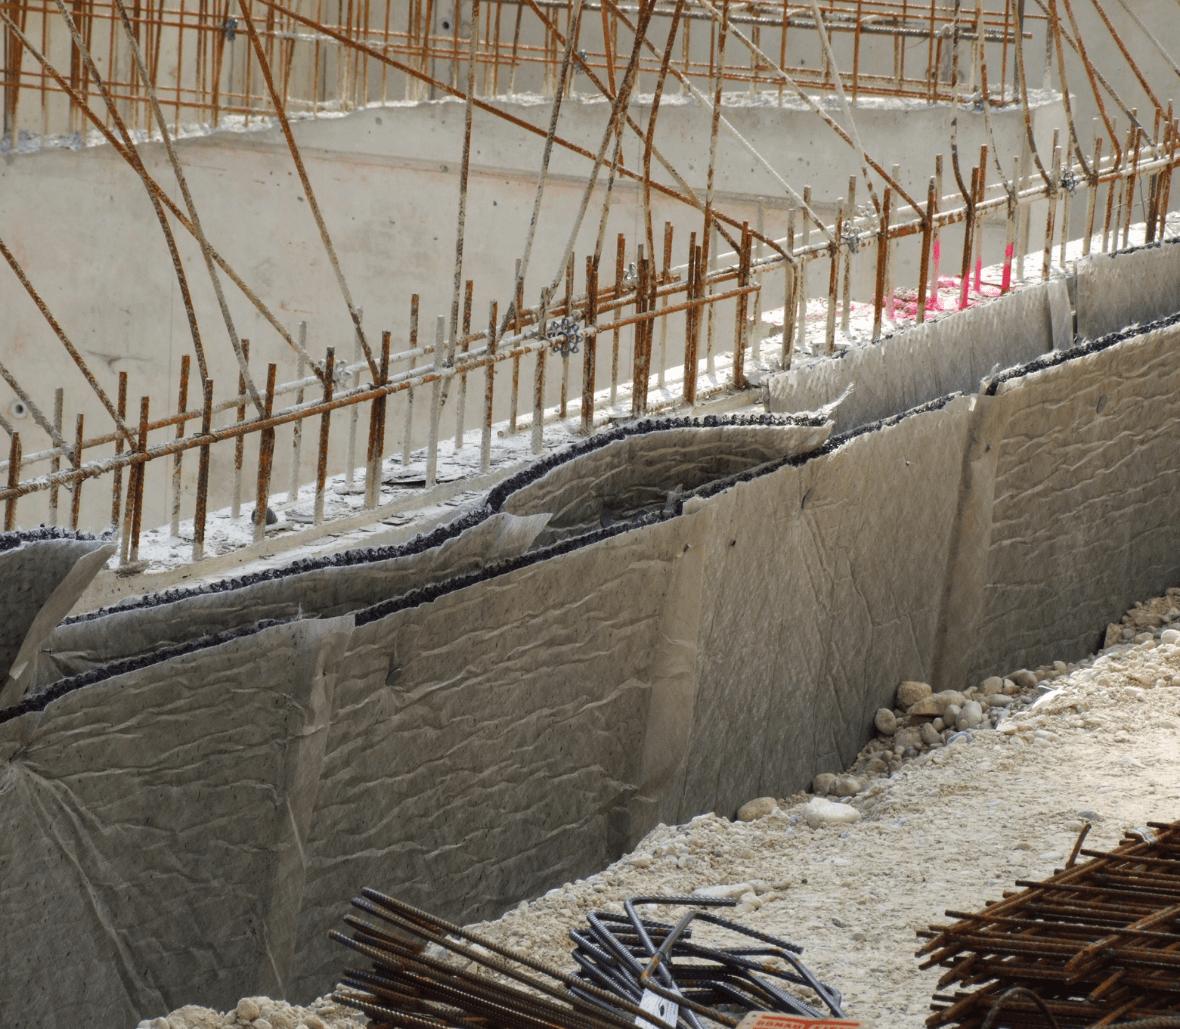 Ground vibration damping Copyrights Low & Bonar_Enka Solutions (10)